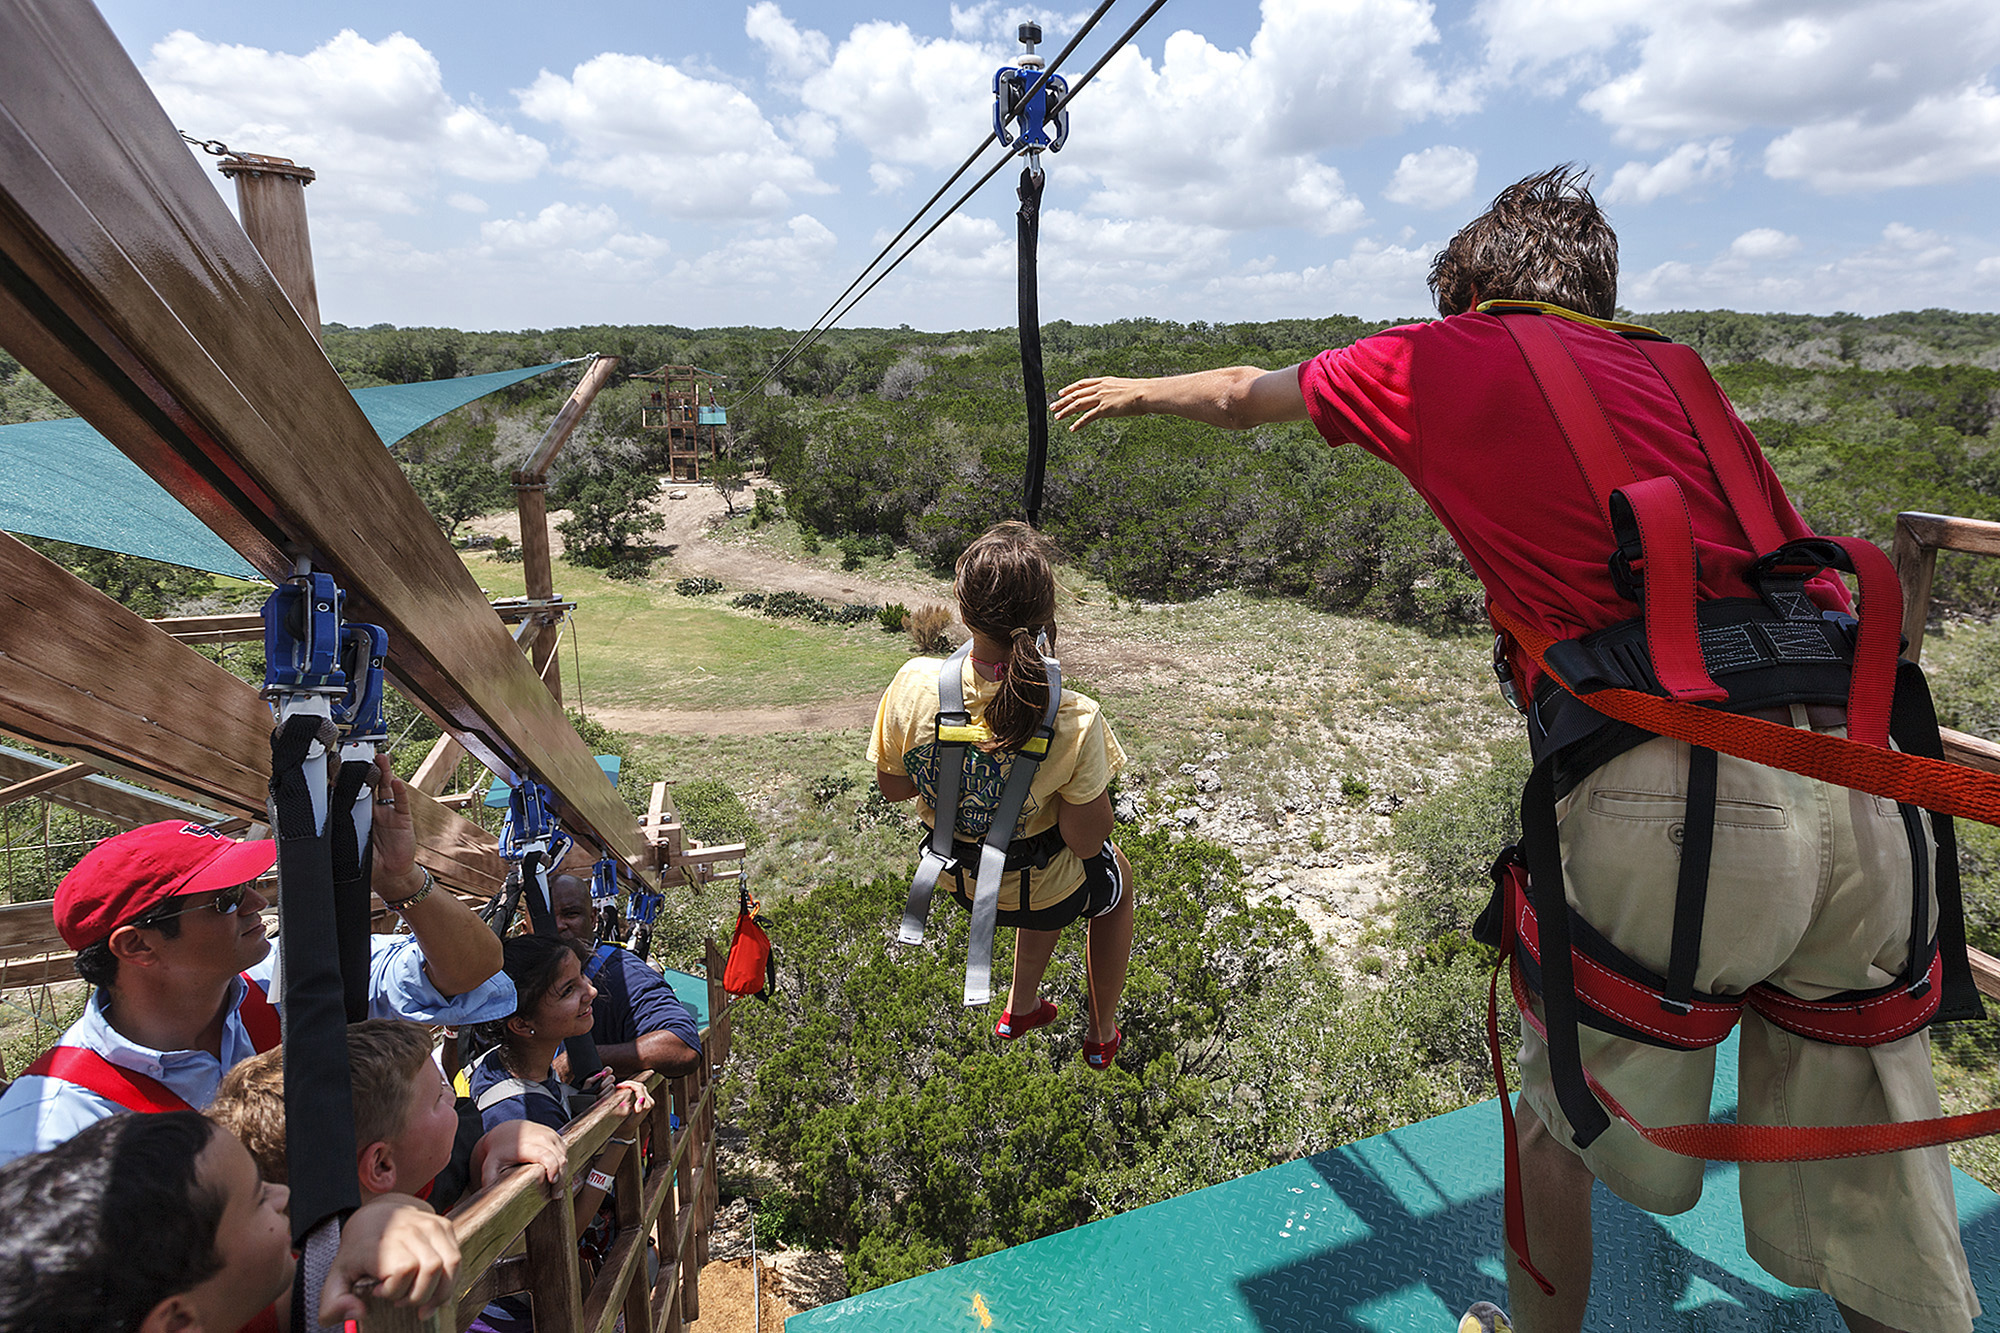 Caverns Opens Challenge Course Zip Line San Antonio